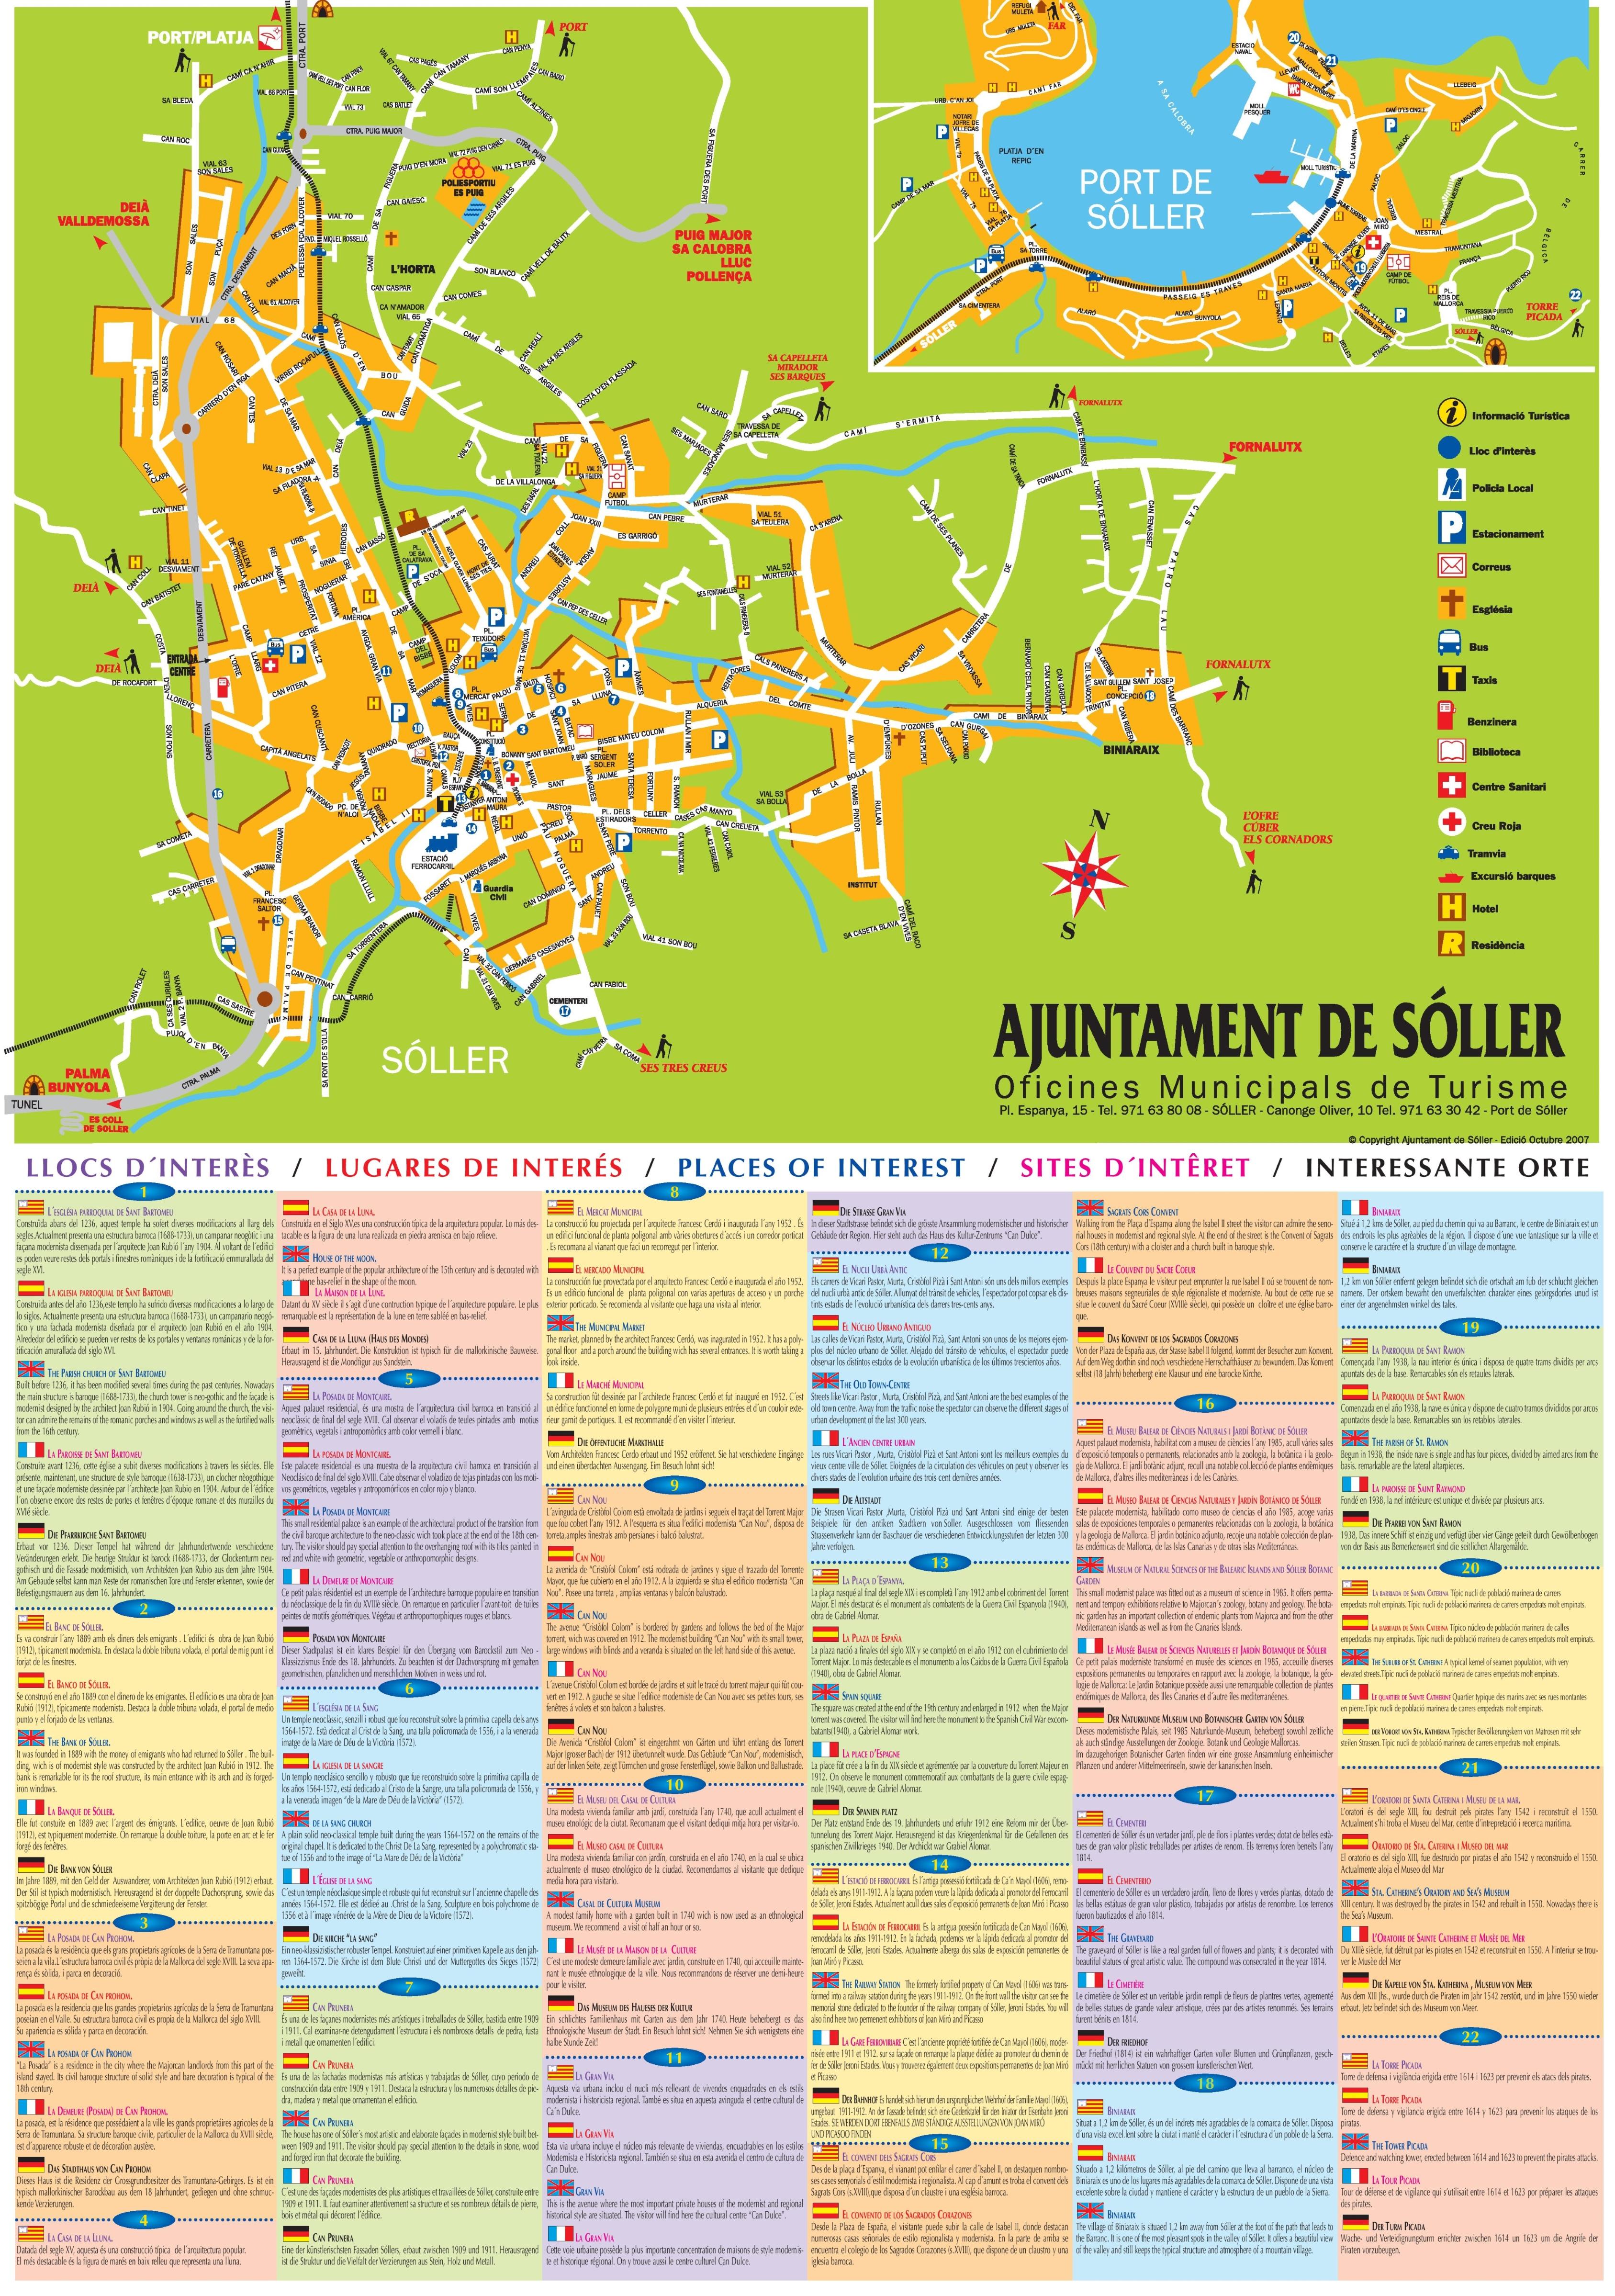 Soller tourist map